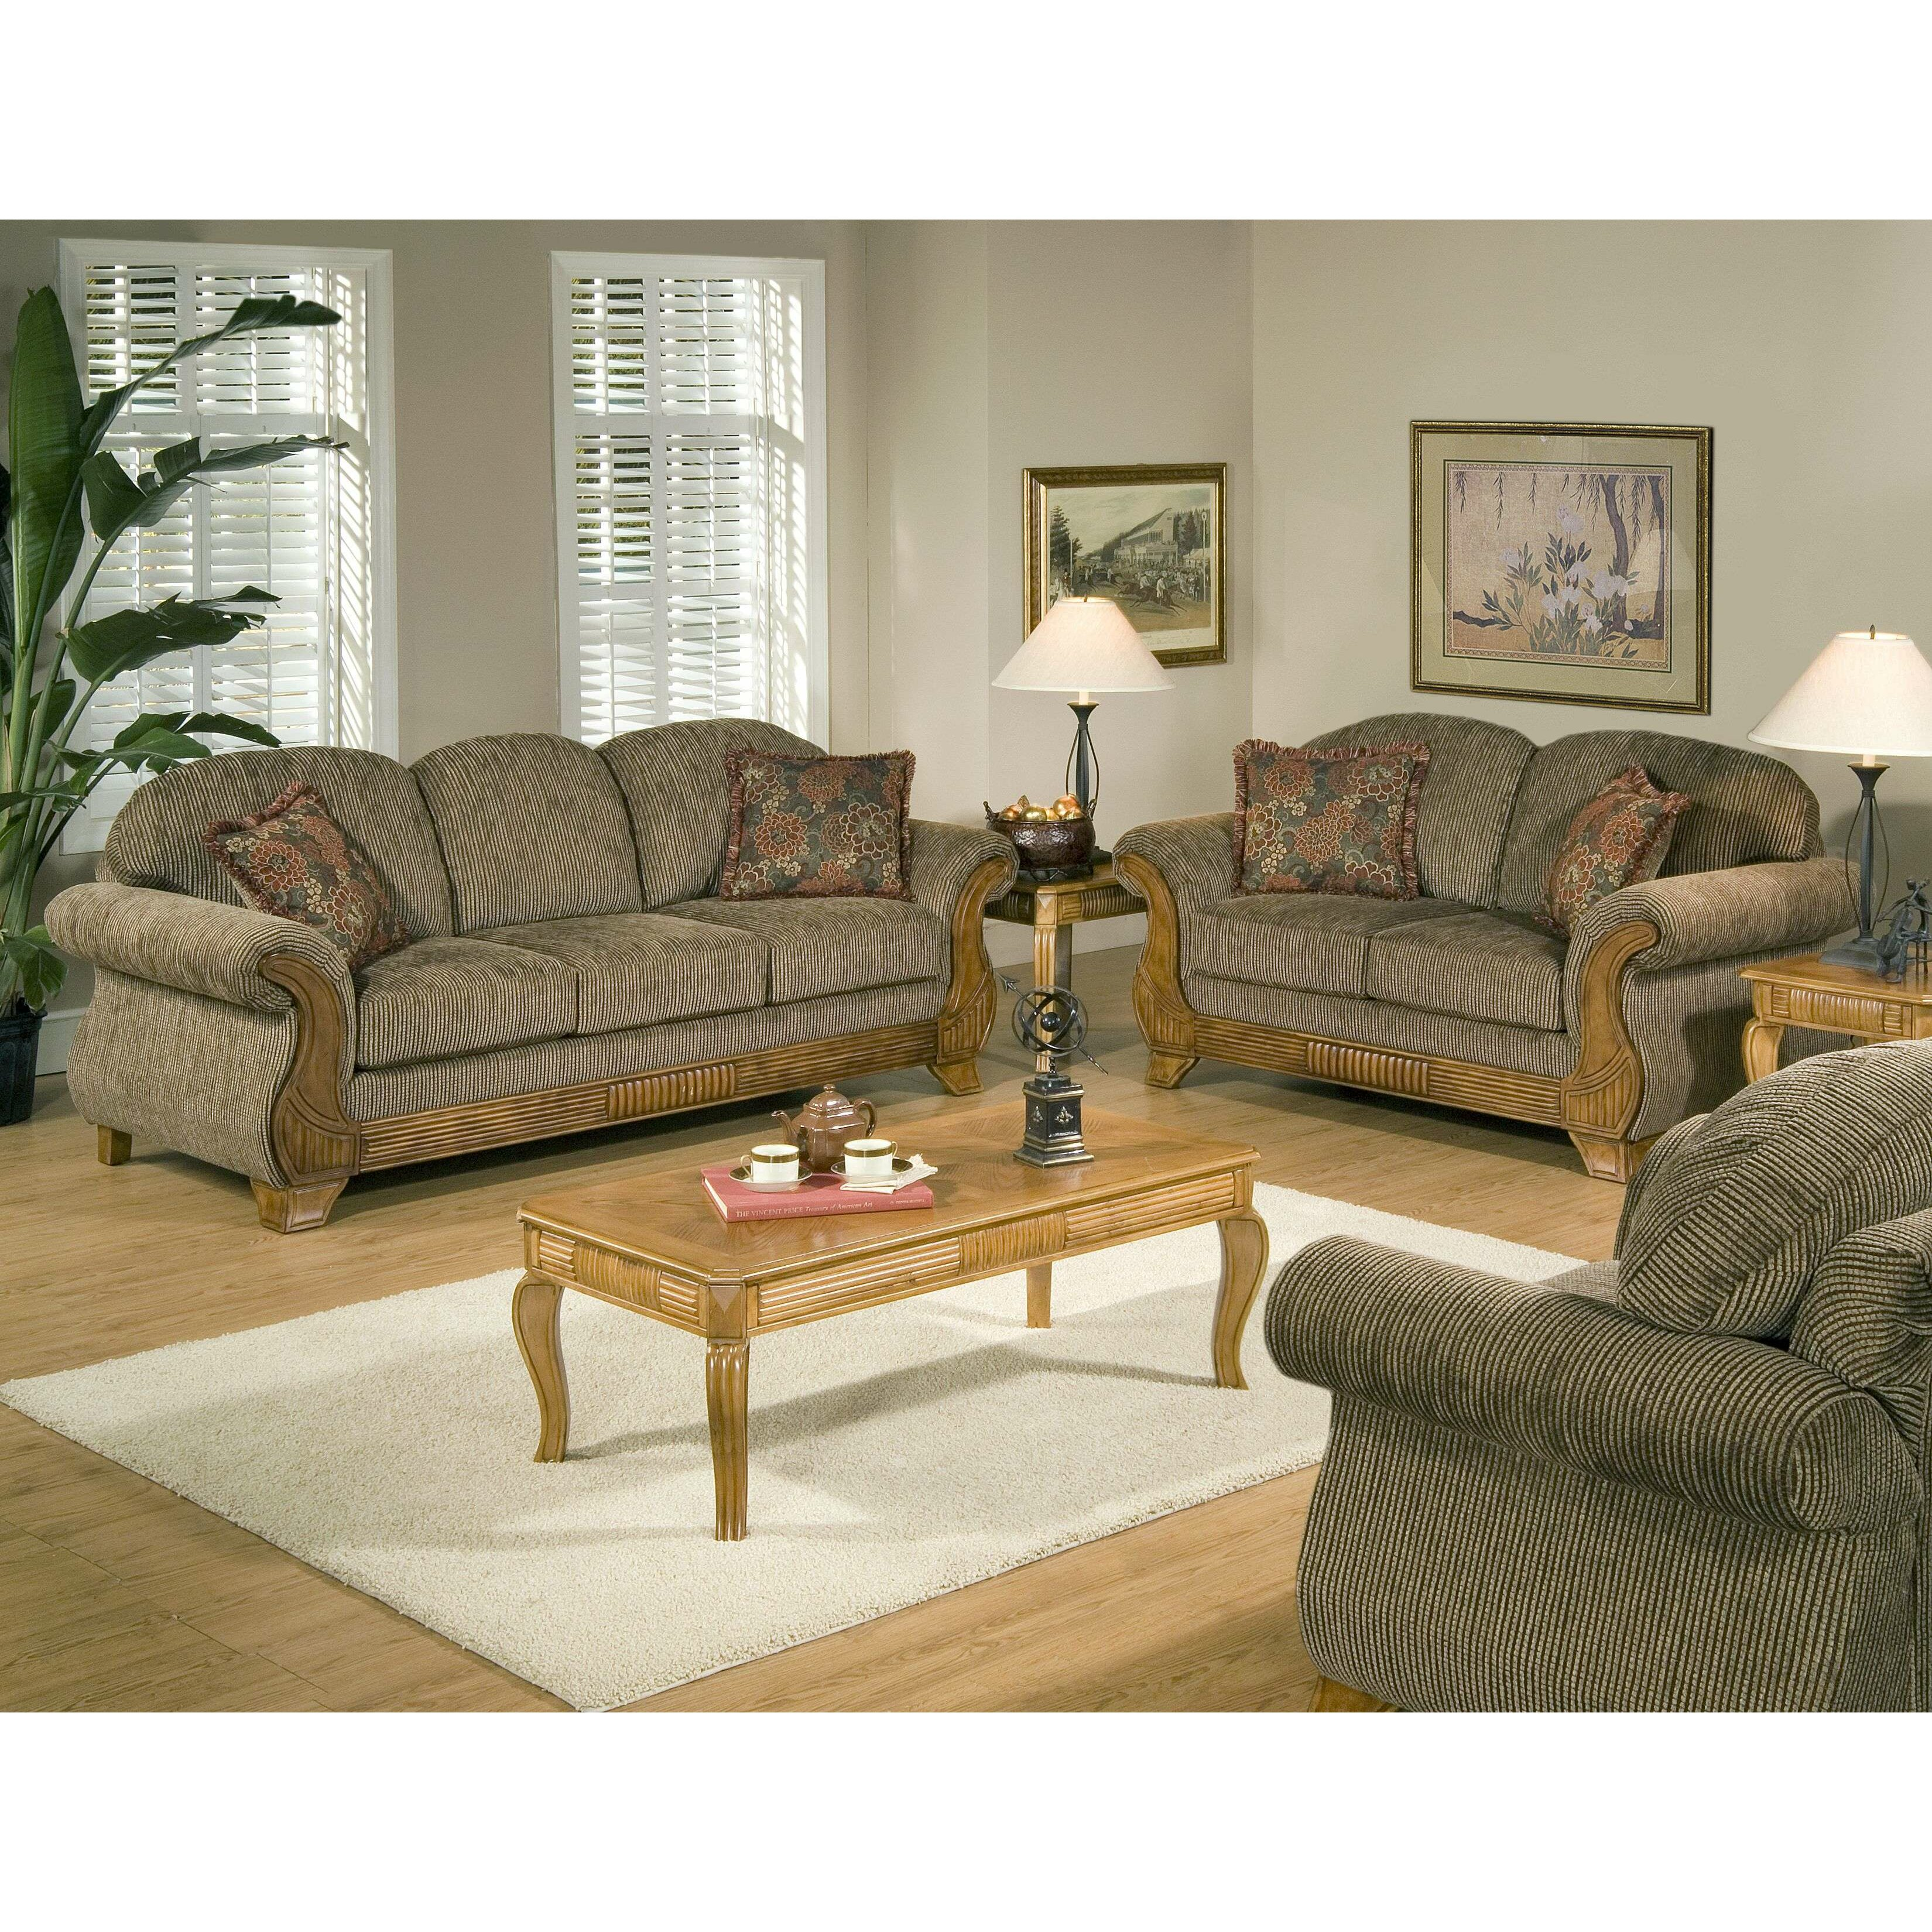 Serta Living Room Furniture Astoria Grand Serta Upholstery Moncalieri Chair Reviews Wayfair